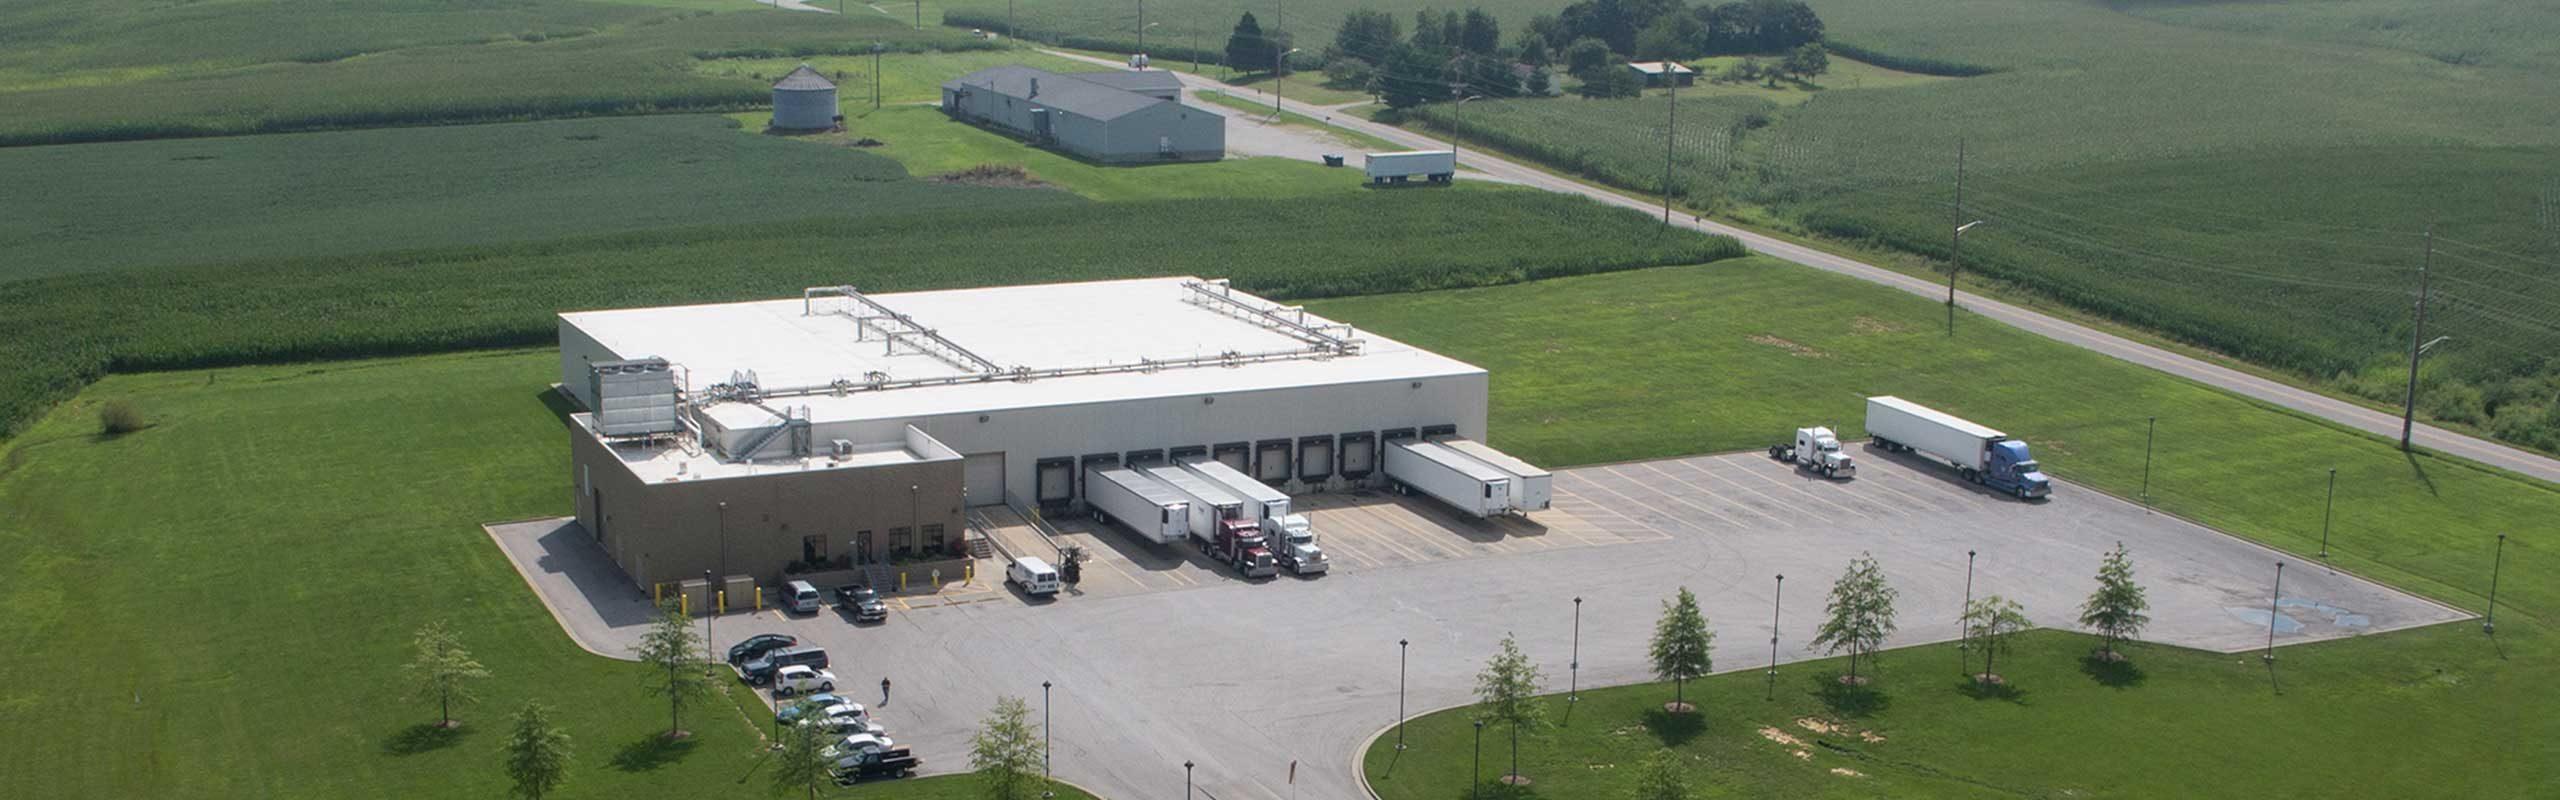 Farbest Foods, Inc. Jasper, Indiana Distribution Center